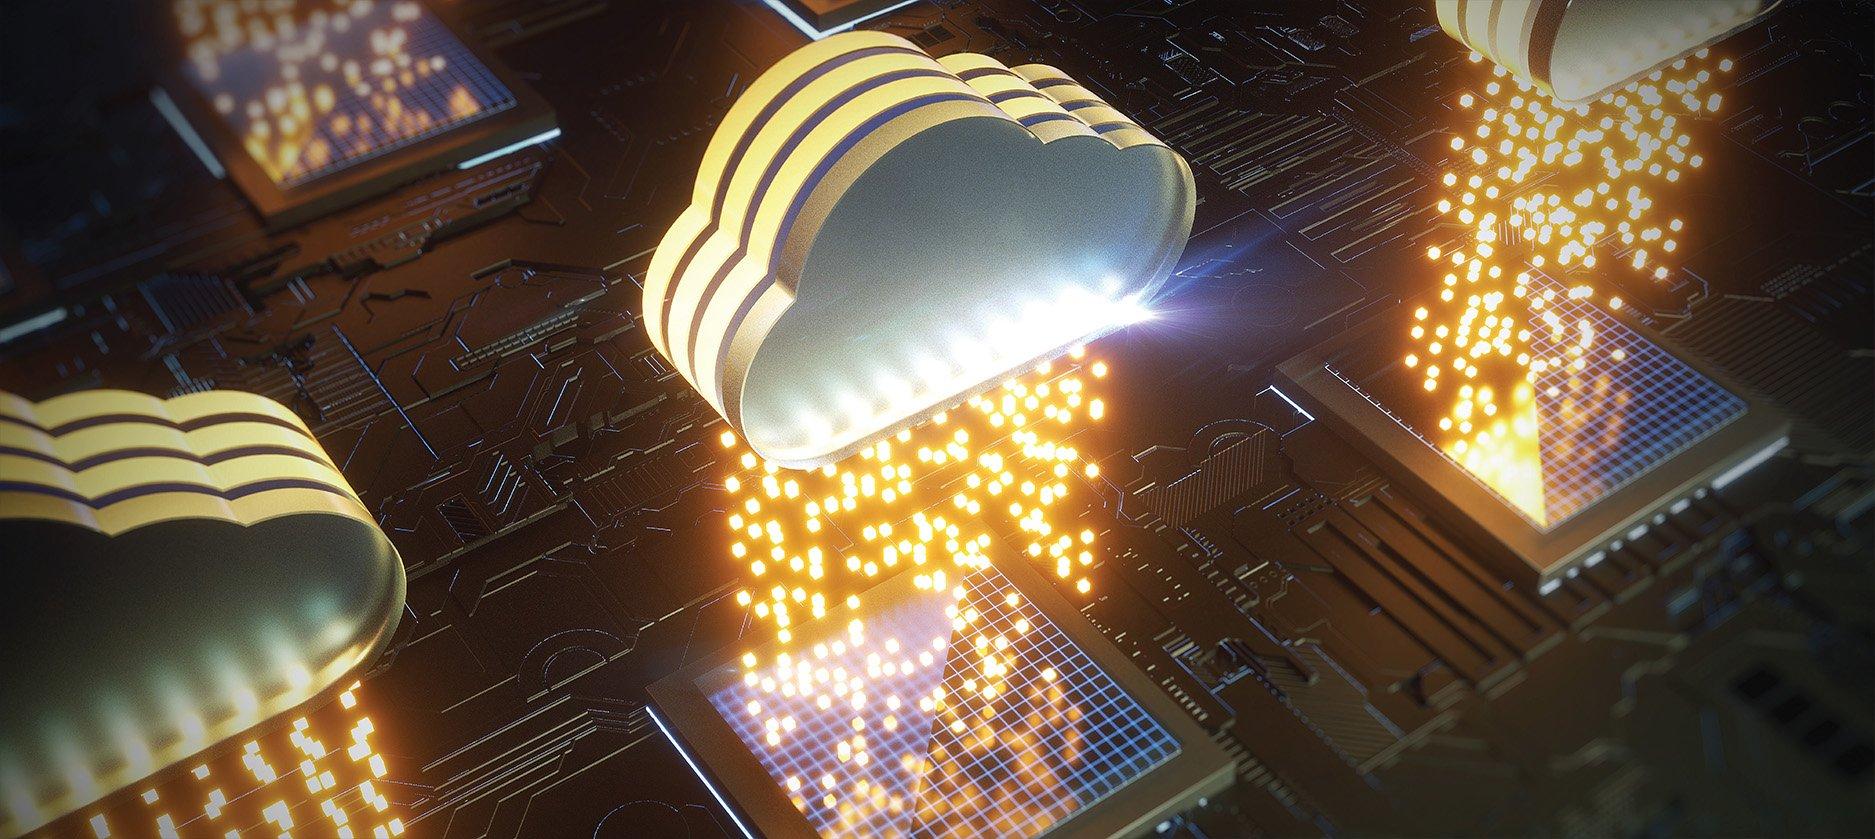 SAP Cloud Lift for Azure_Header Image_7 March